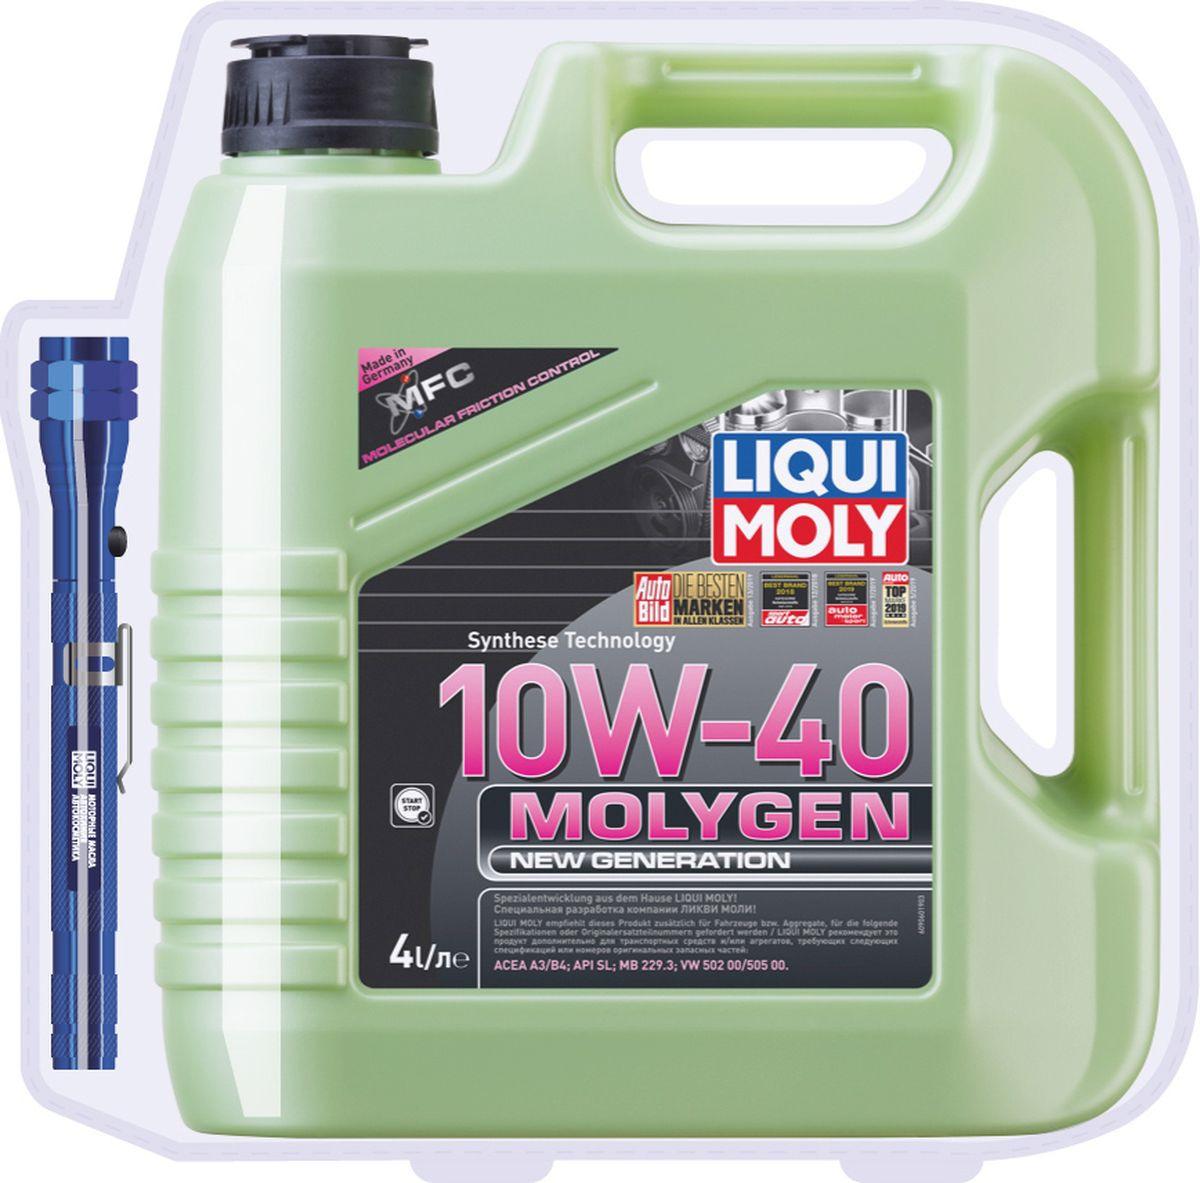 Моторное масло Liqui Moly Molygen New Generation, НС-синтетическое, 10W-40, 4 л + Фонарик в подарок 9042d liquimoly нс синт мот масло molygen new generation 5w 30 4л фонарик арт 7520r